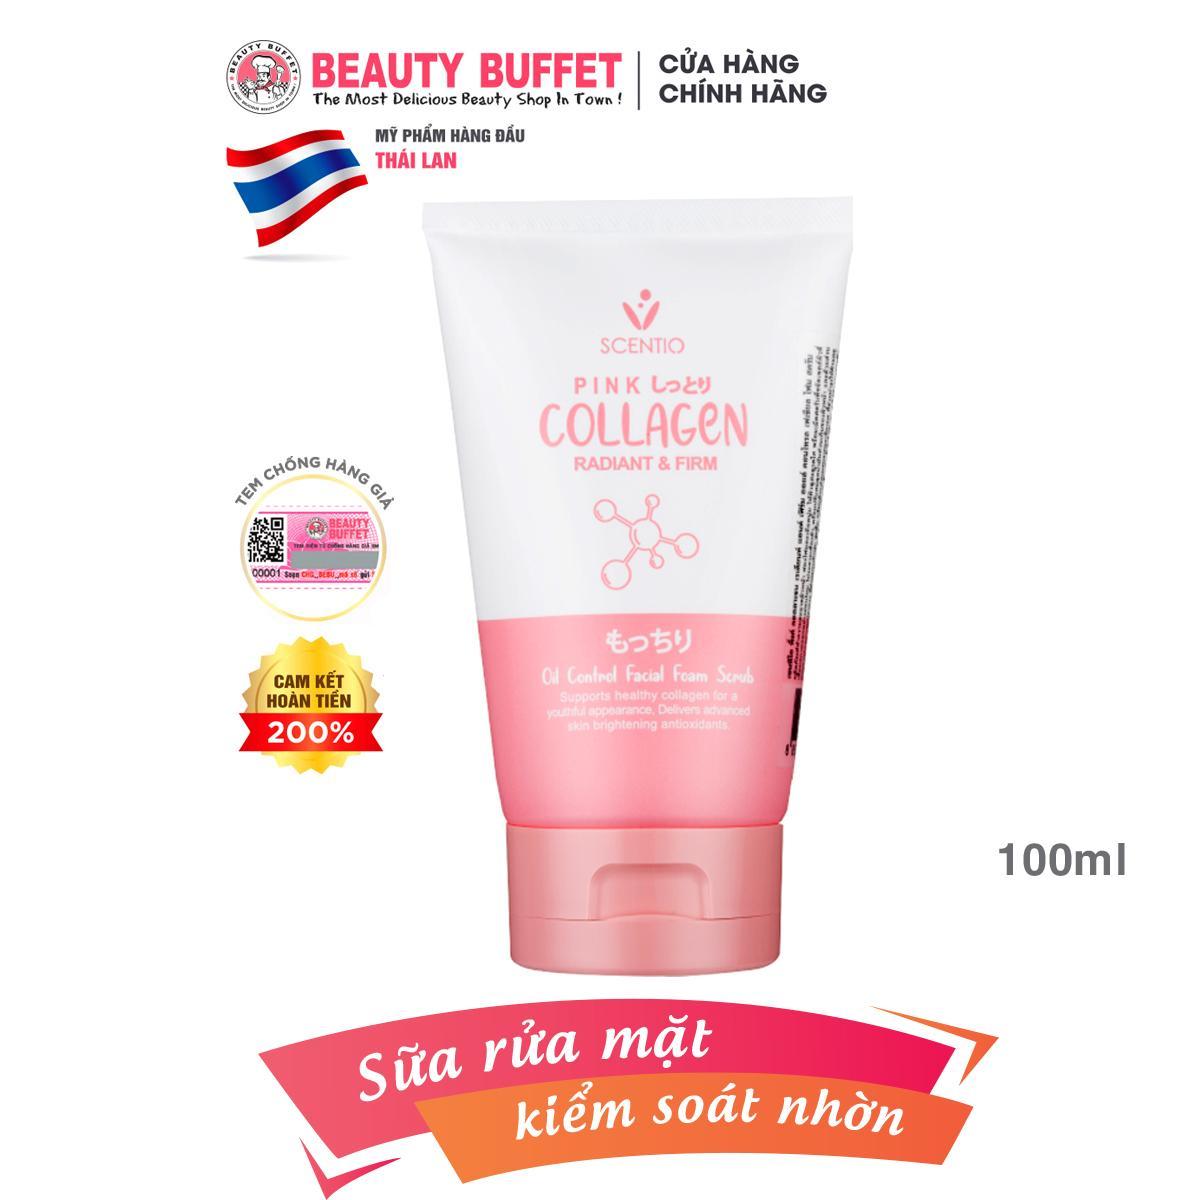 Sữa rửa mặt kiểm soát nhờn Scentio Pink Collagen 100ml cao cấp